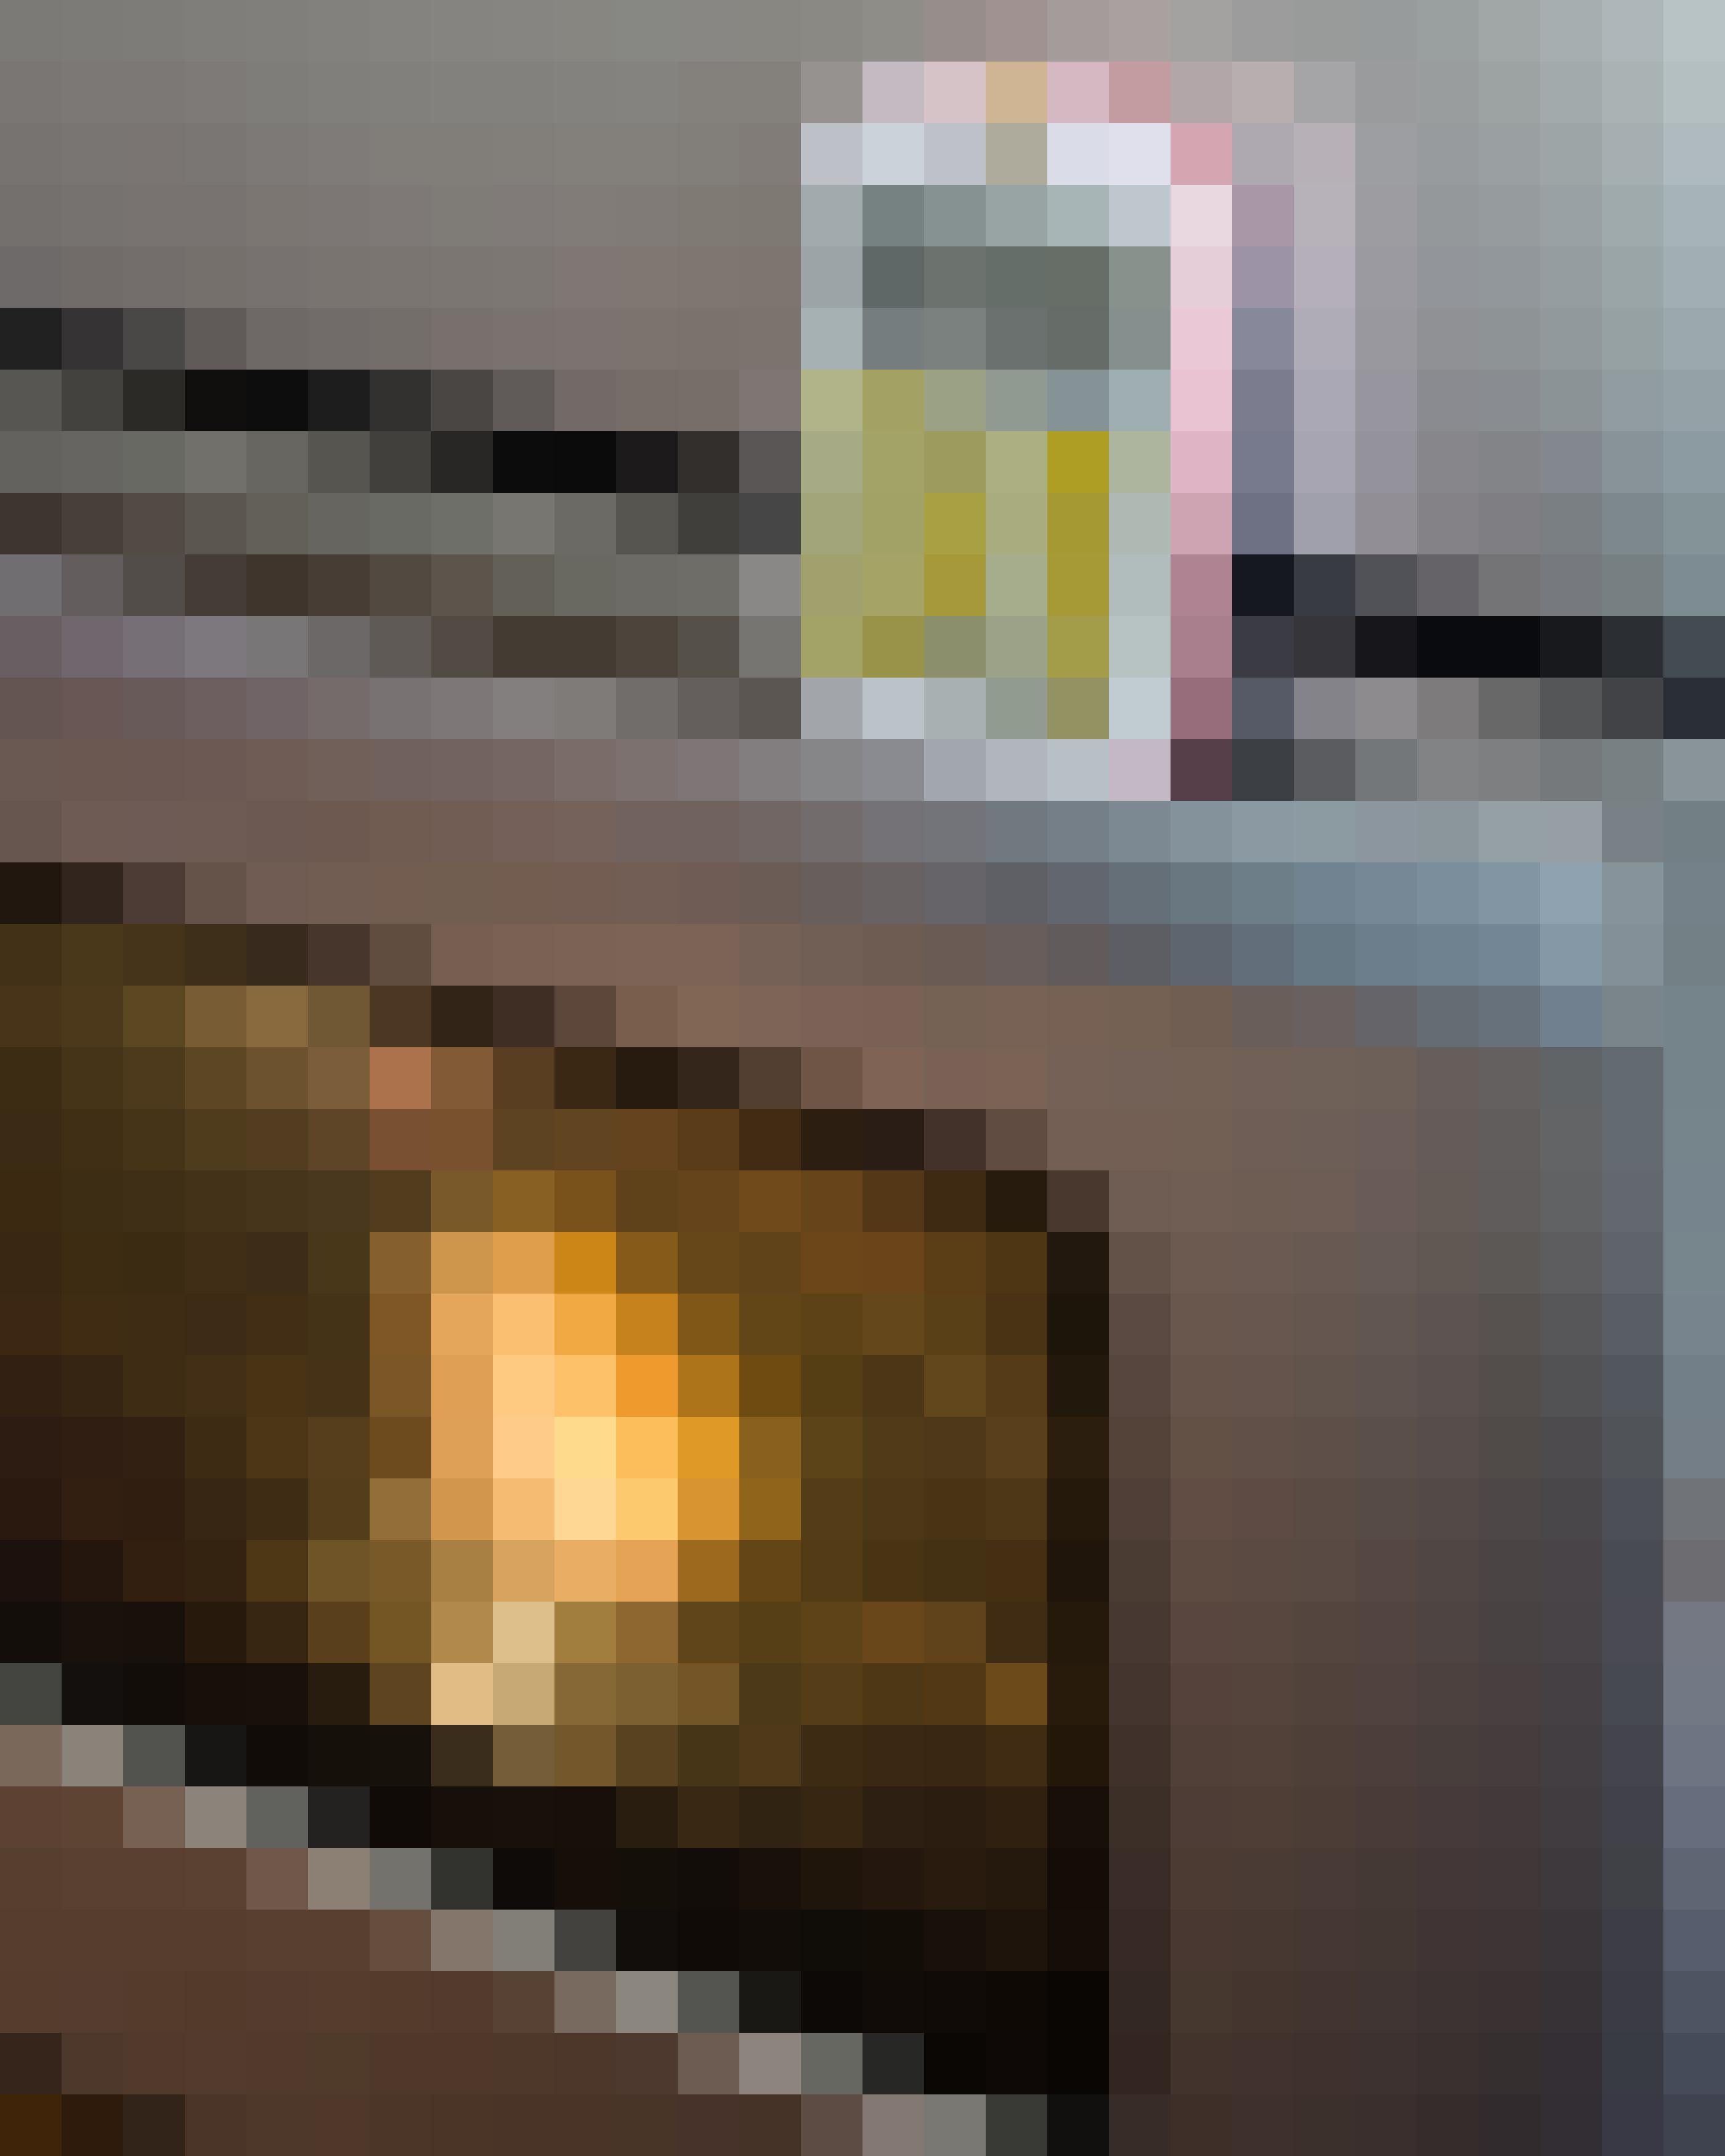 How To Make Roasted Pork Tenderloin: gallery image 6